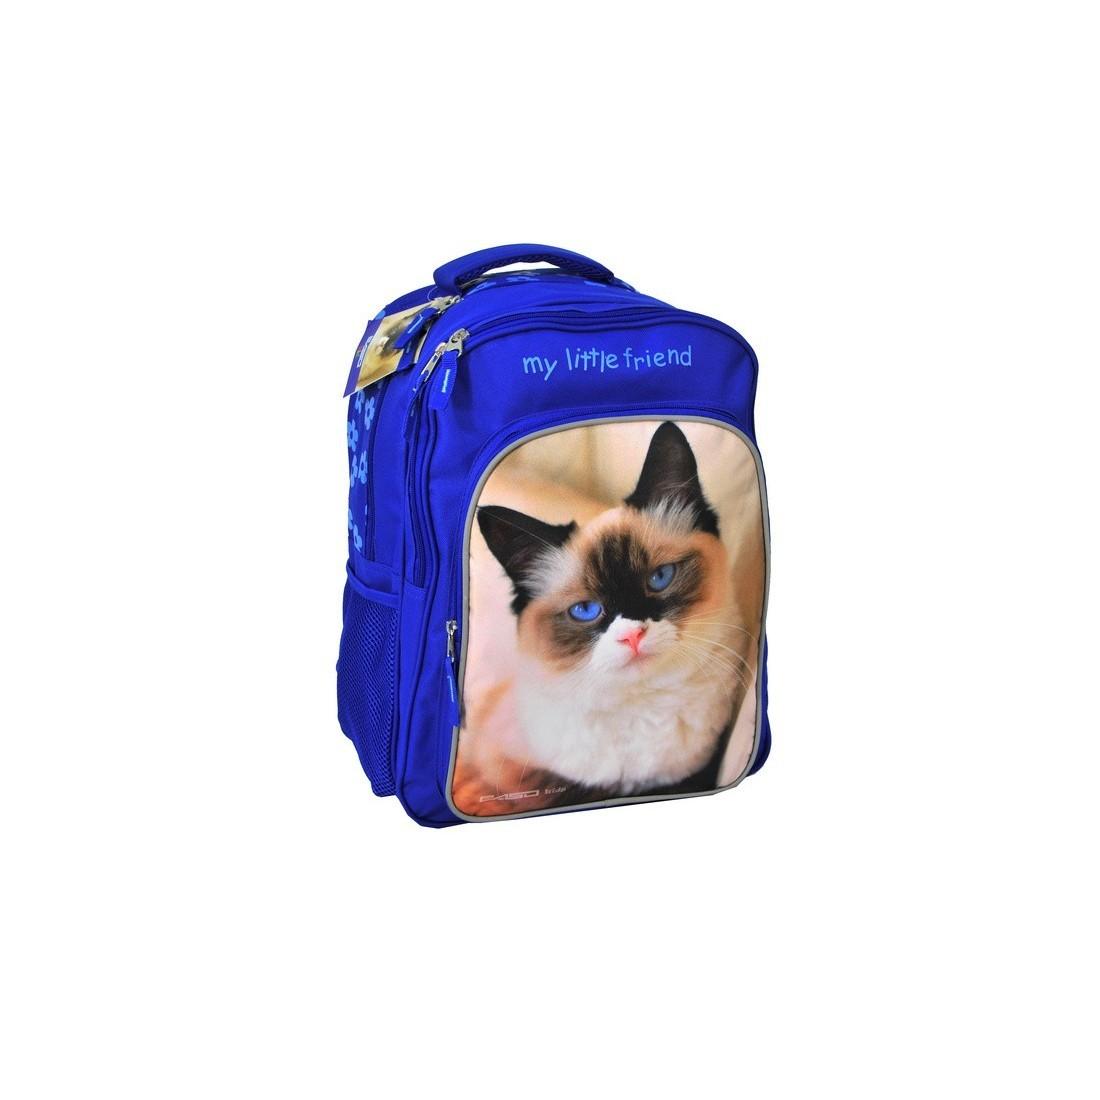 Plecak szkolny z kotkiem - plecak-tornister.pl